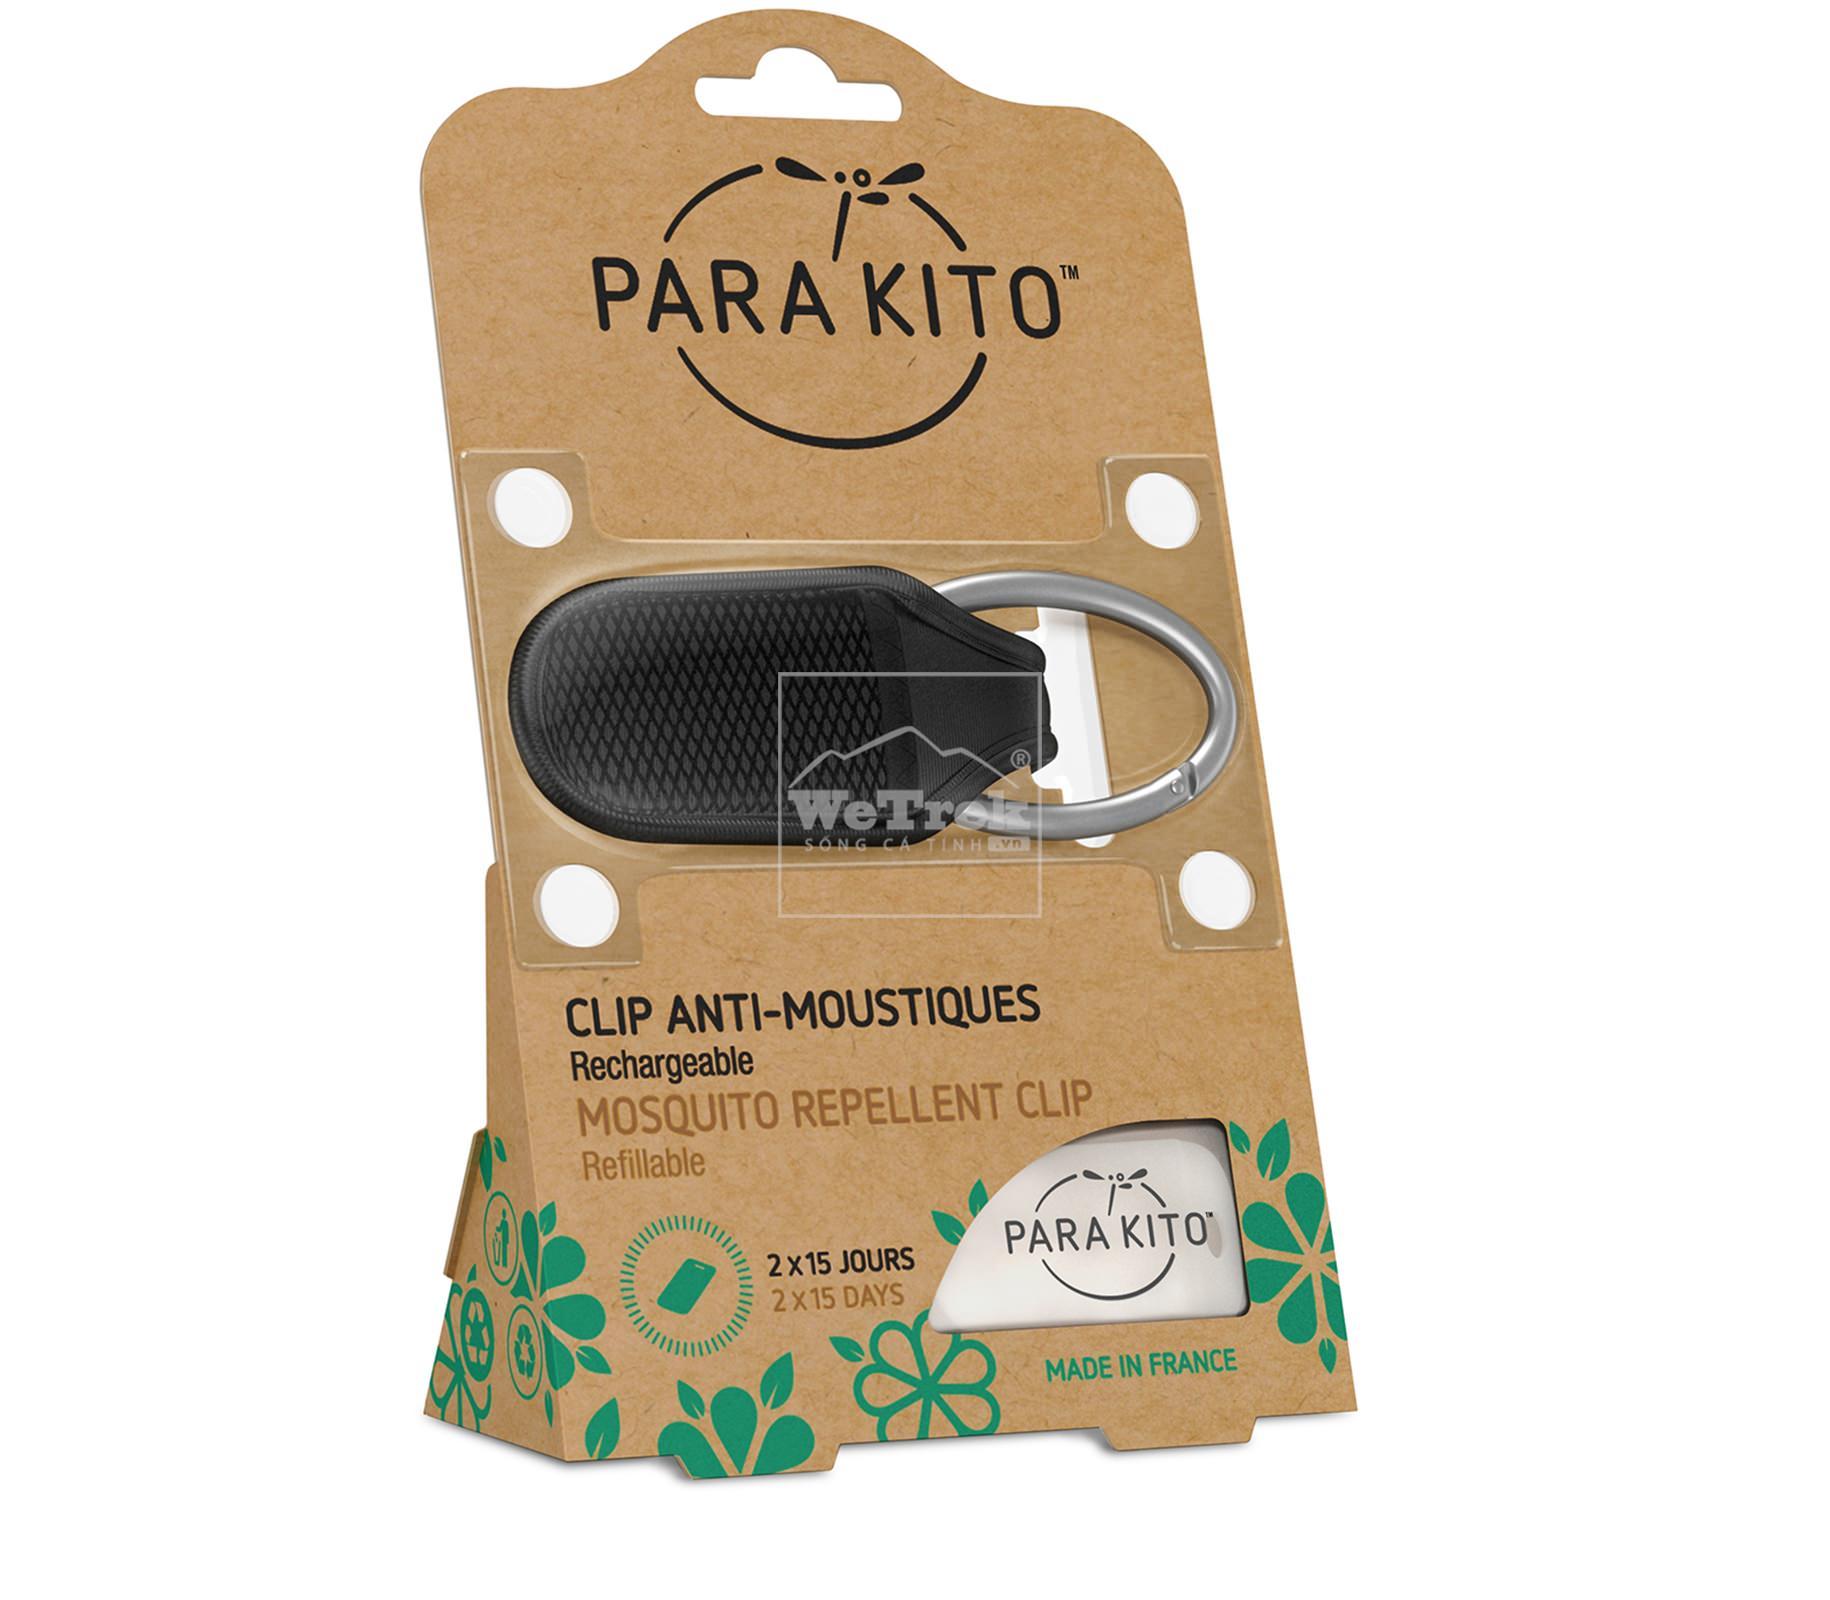 vien-chong-muoi-kem-moc-cài-parakito-black-clip-7650-wetrek.vn-1